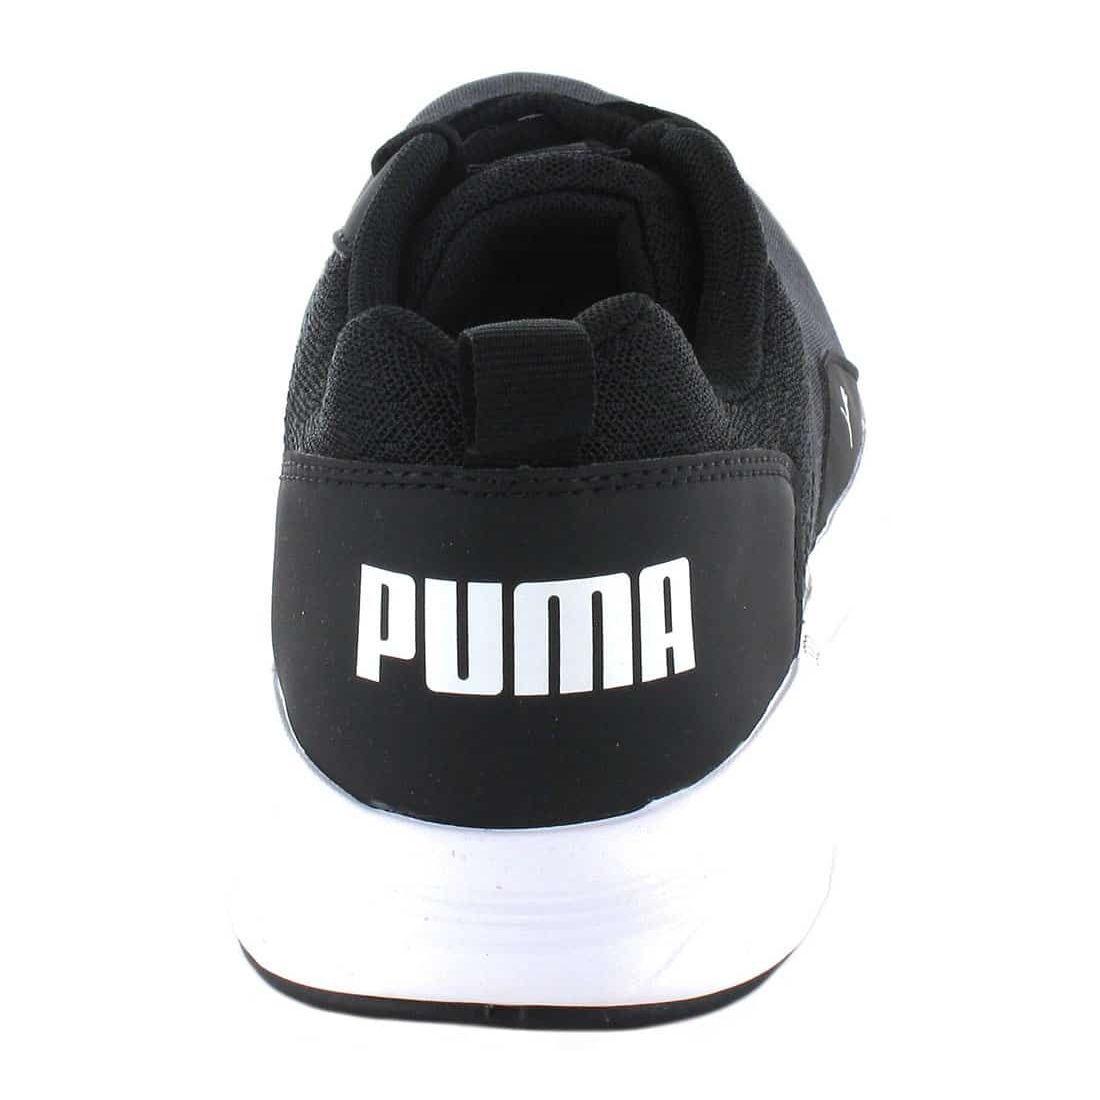 Puma NRGY Comet Black White